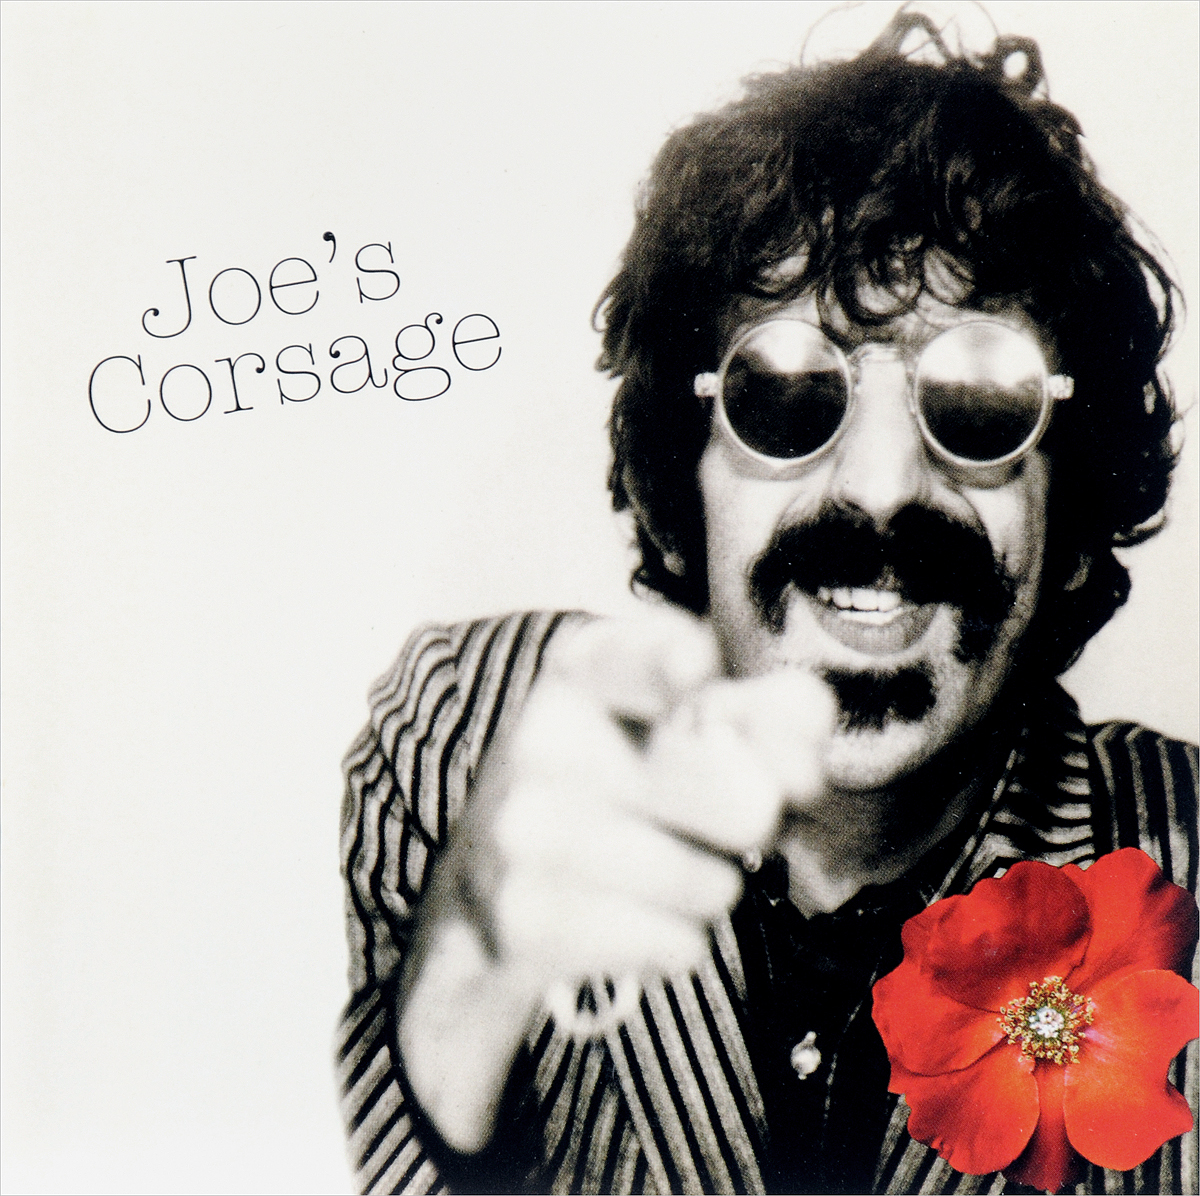 лучшая цена Фрэнк Заппа Frank Zappa. Joe's Corsage